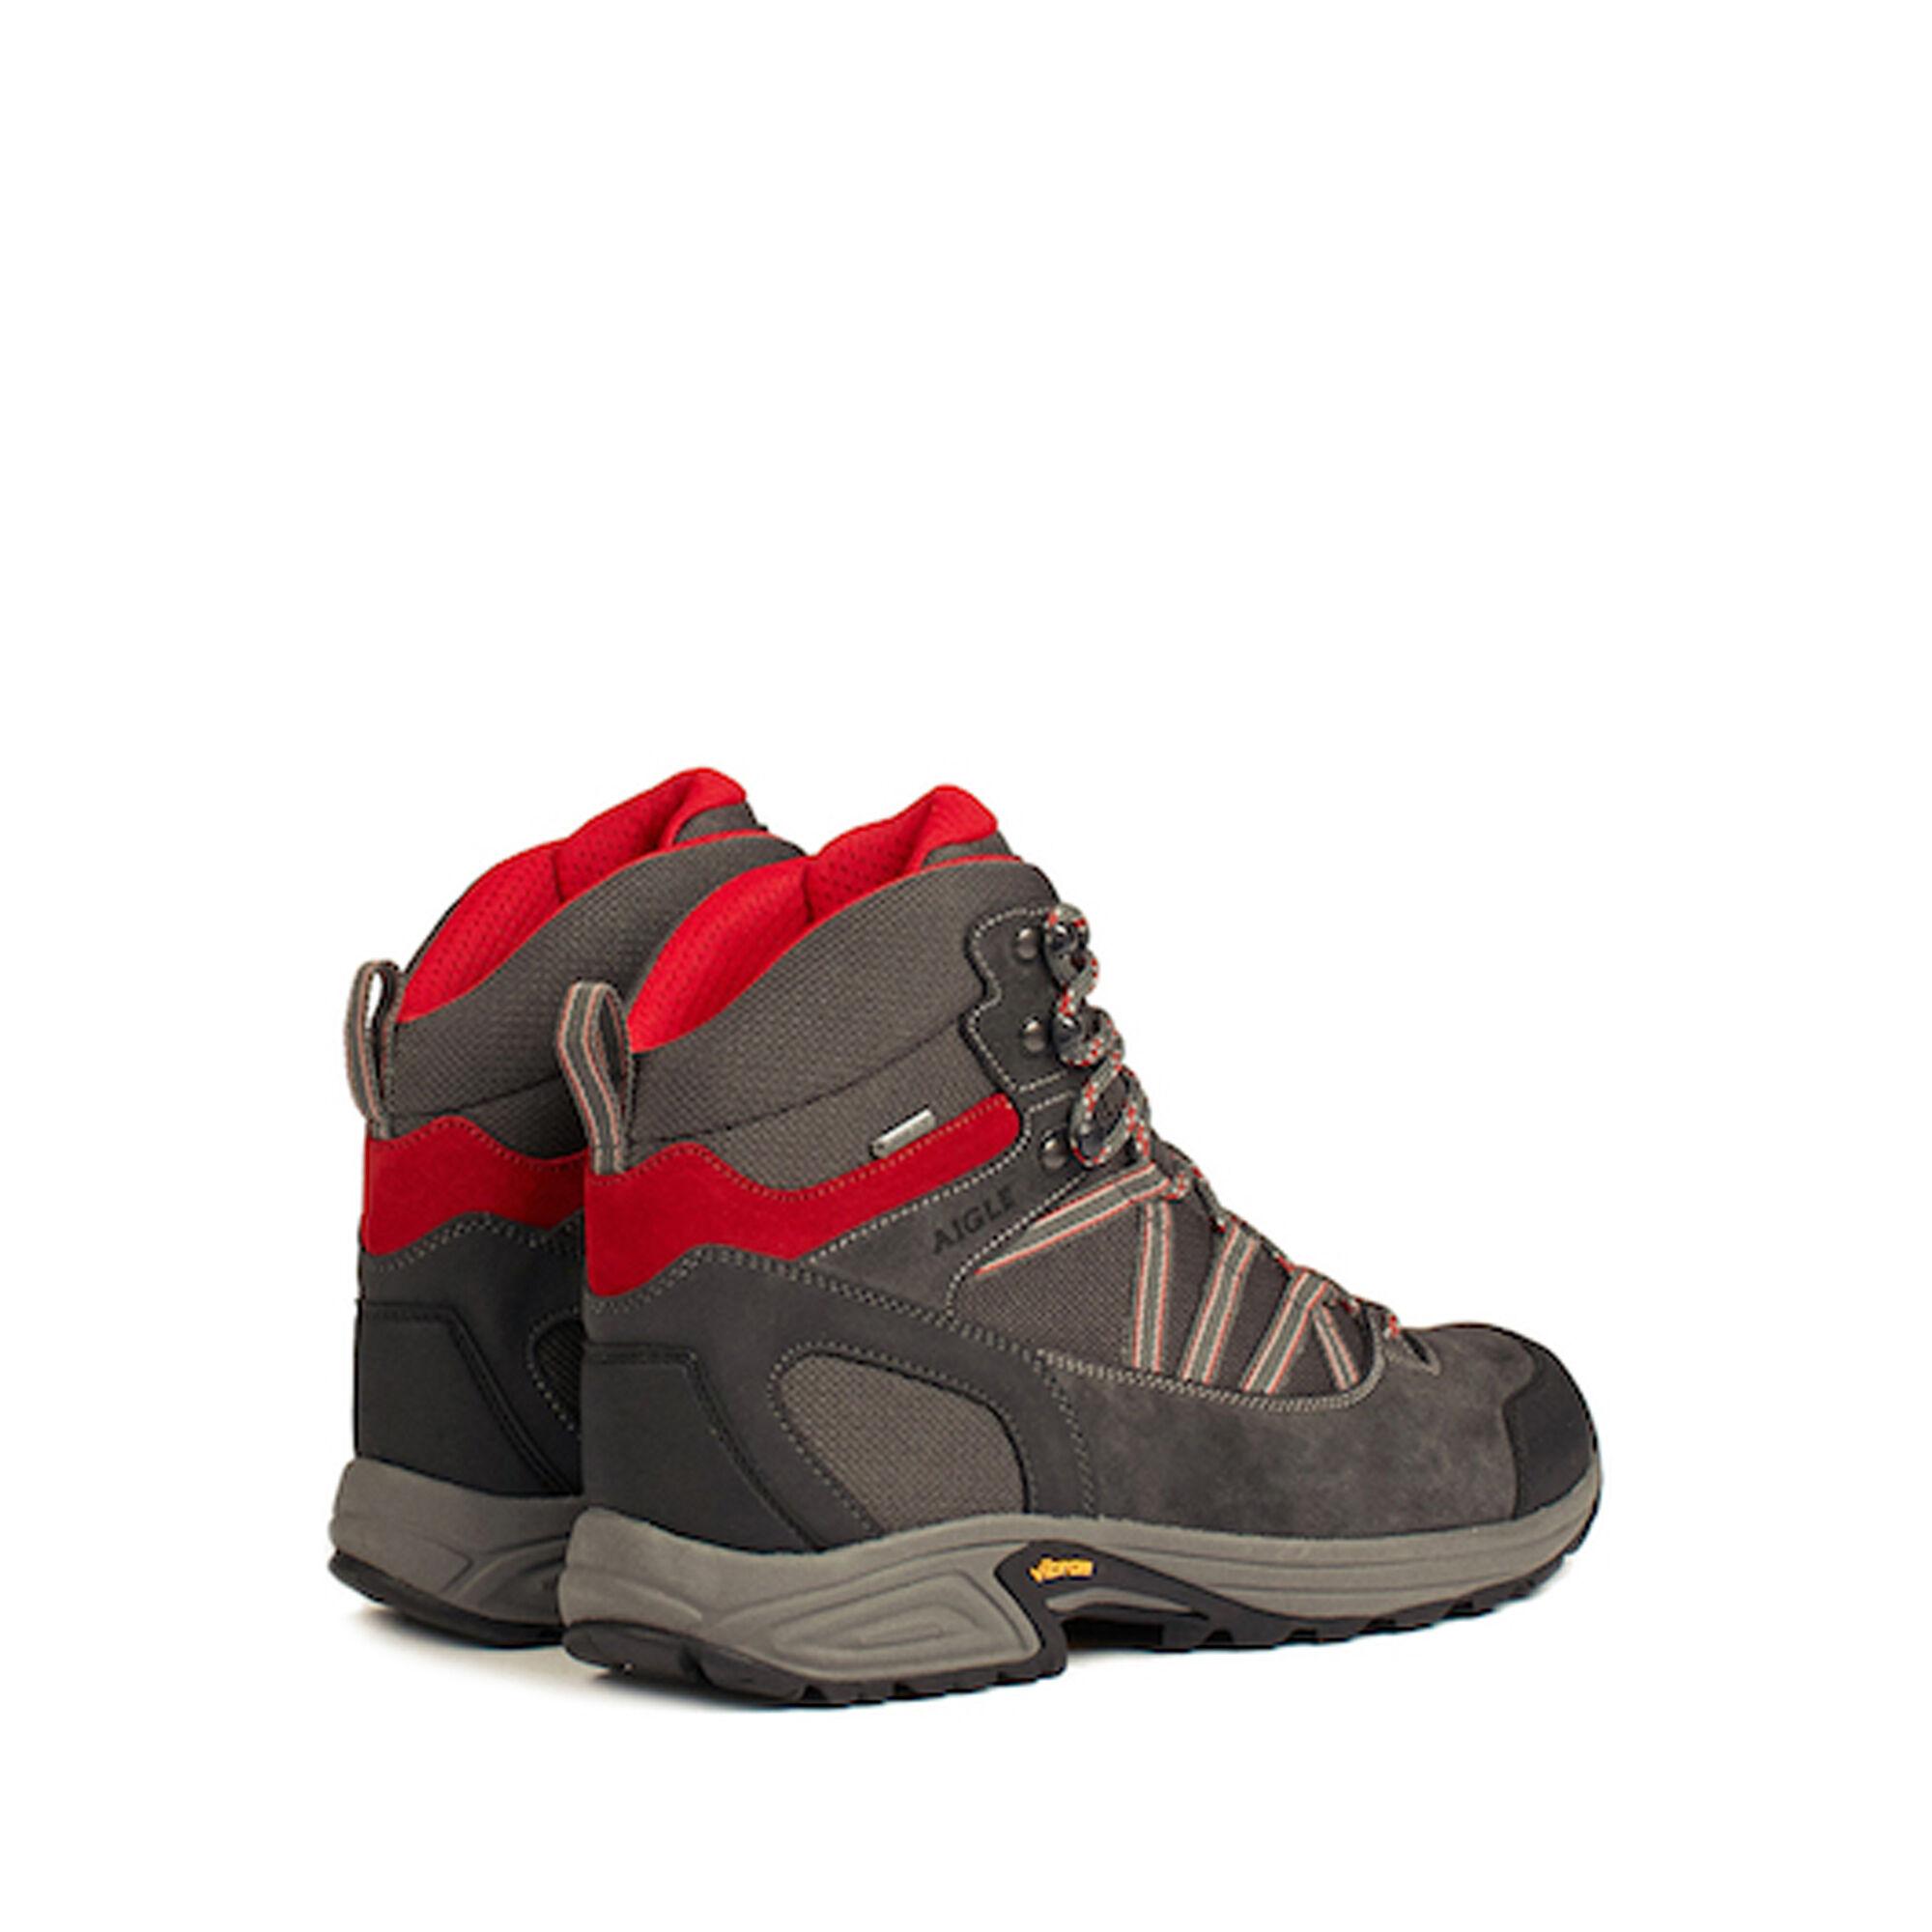 Homme Gore Petite Chaussures Aigle Randonnée Tex® WFw8xqYU